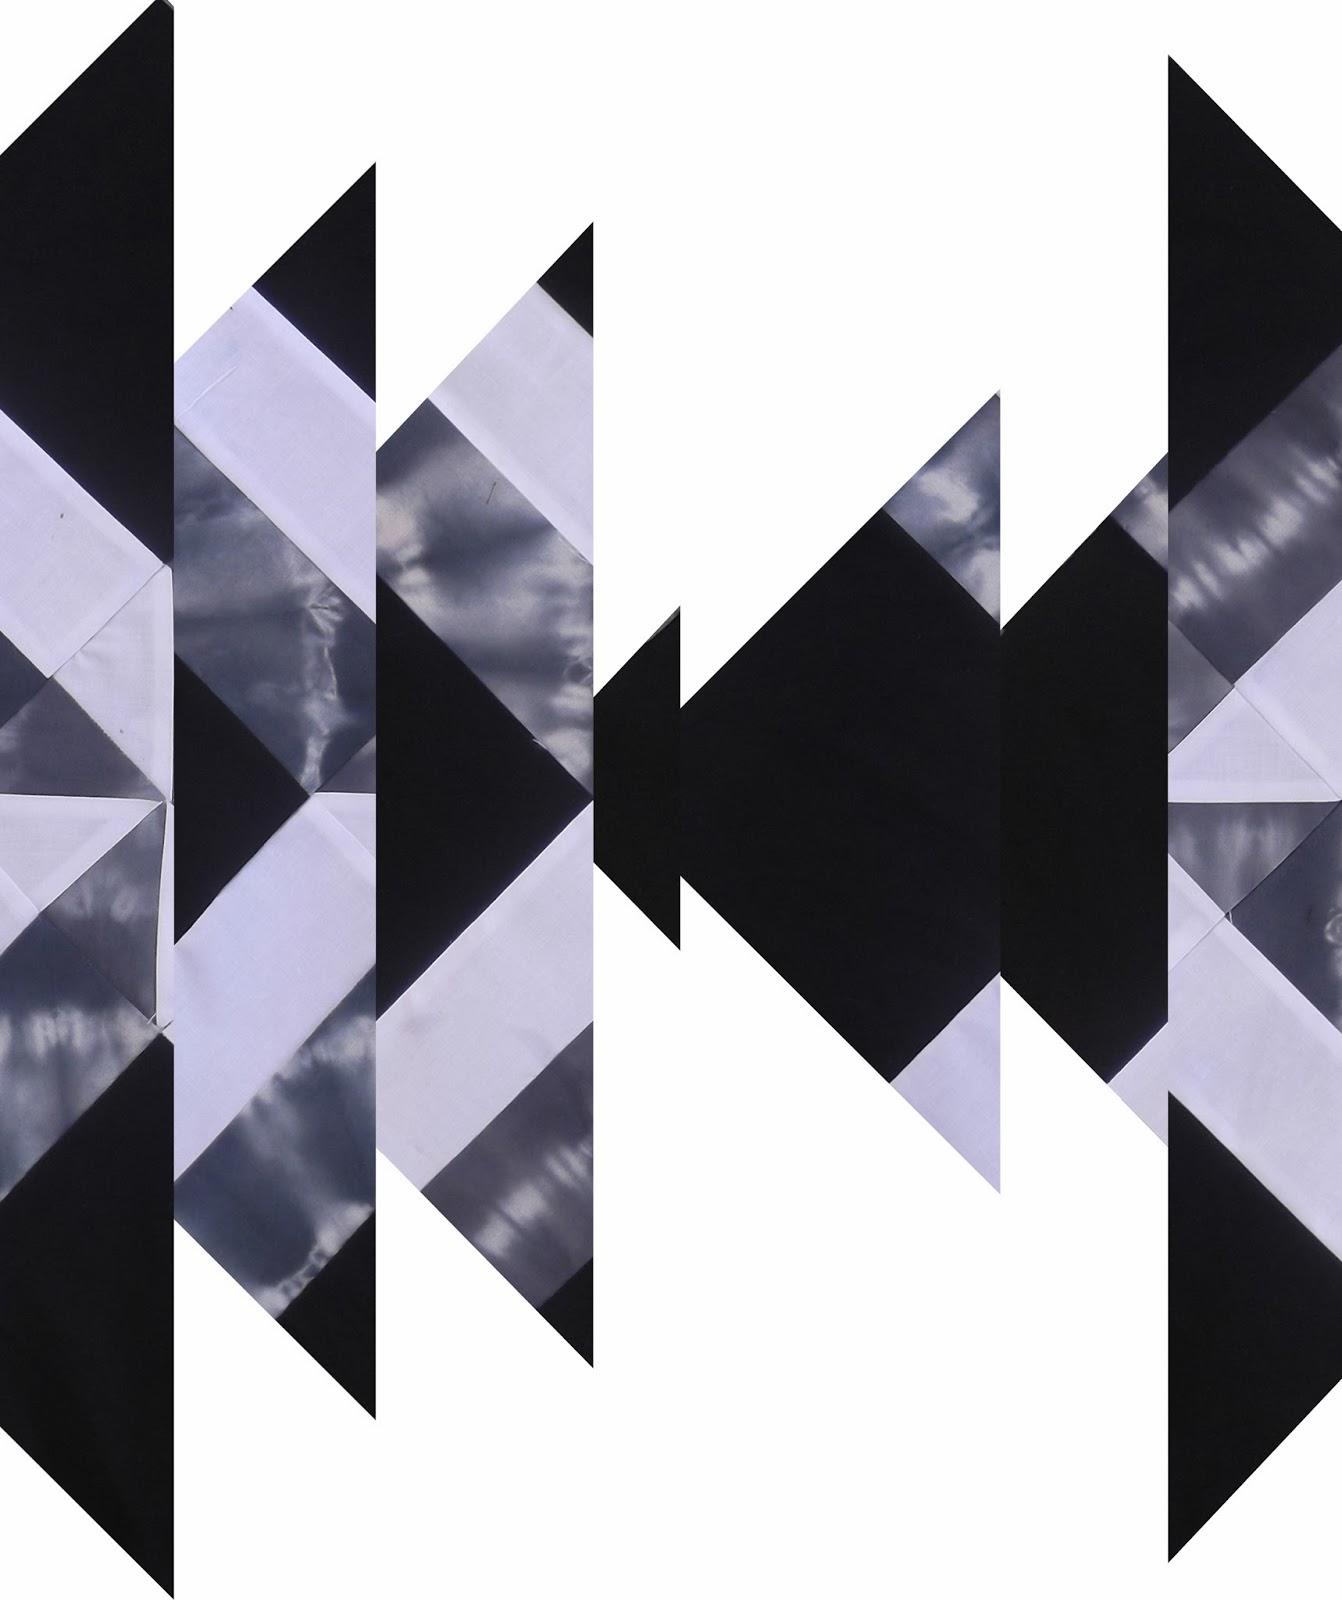 patchwork, patchwork σχέδια, patchwork ασπρόμαυρο, patchwork ιδέες, τέχνη με ύφασμα,